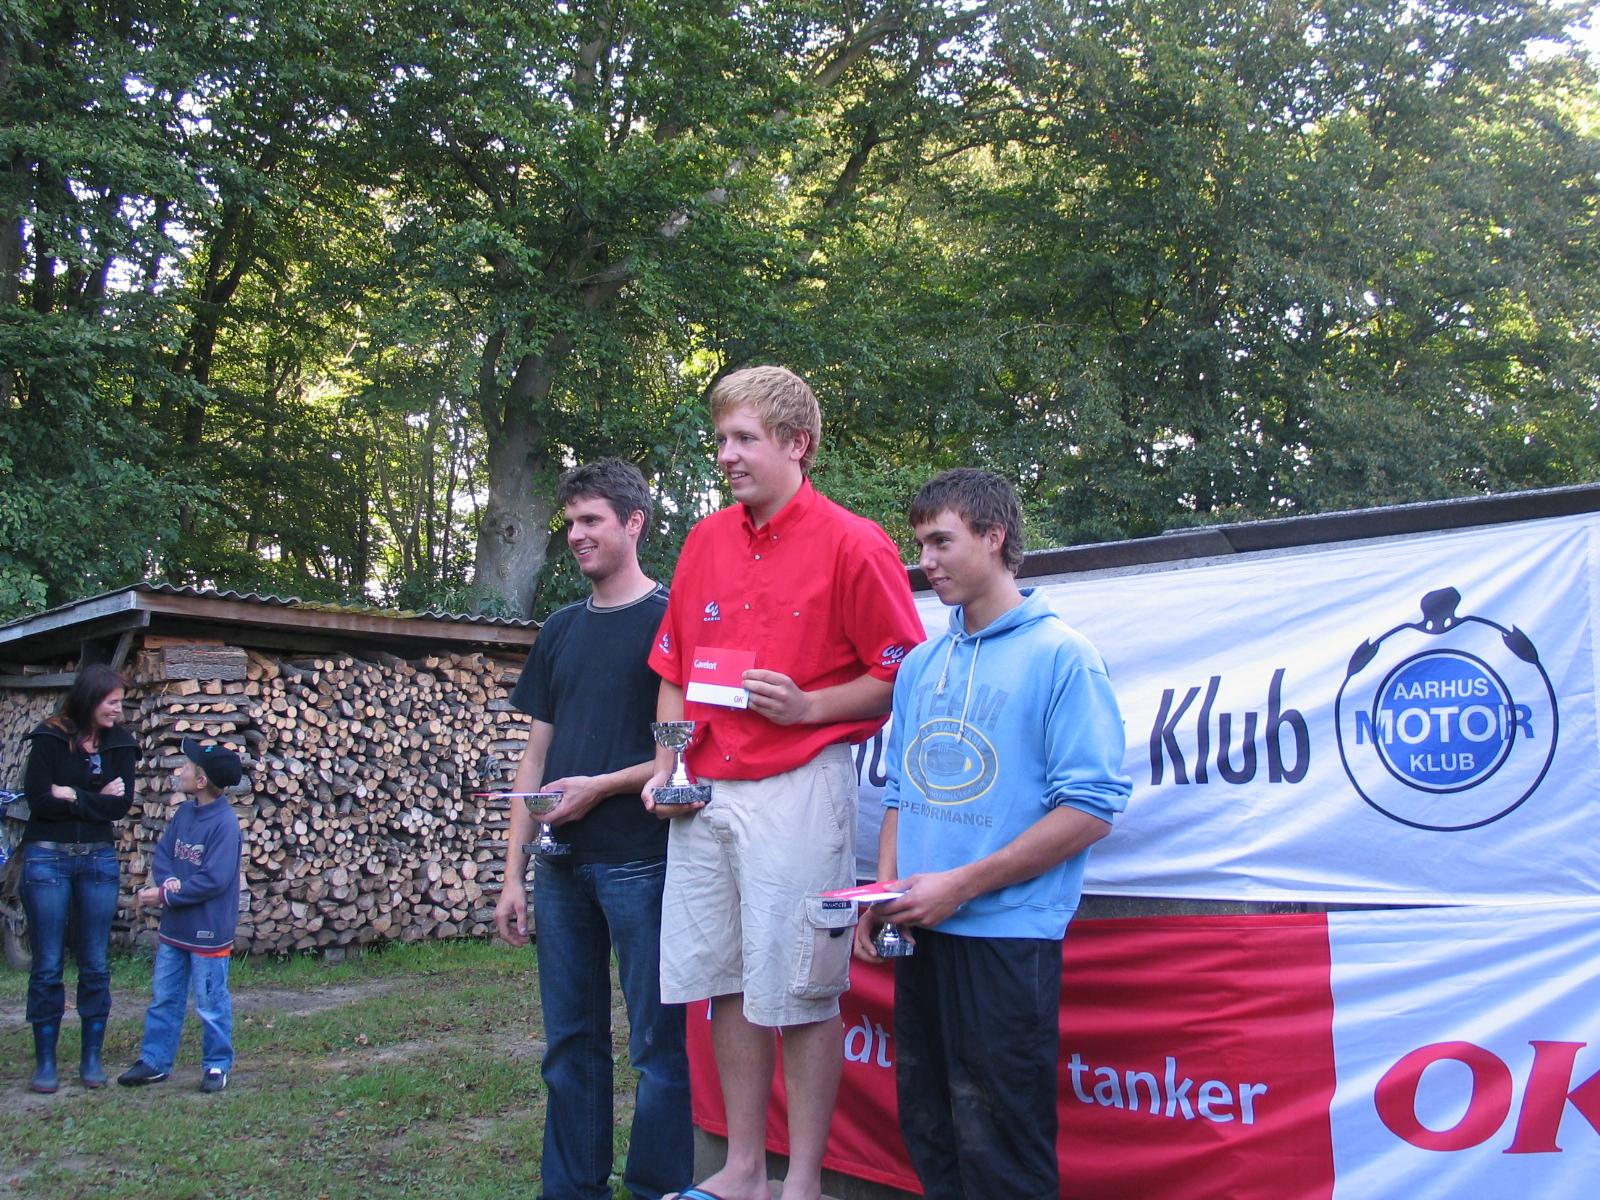 Niels Nicolaisen vandt Elite foran Thomas Pedersen og Gregers